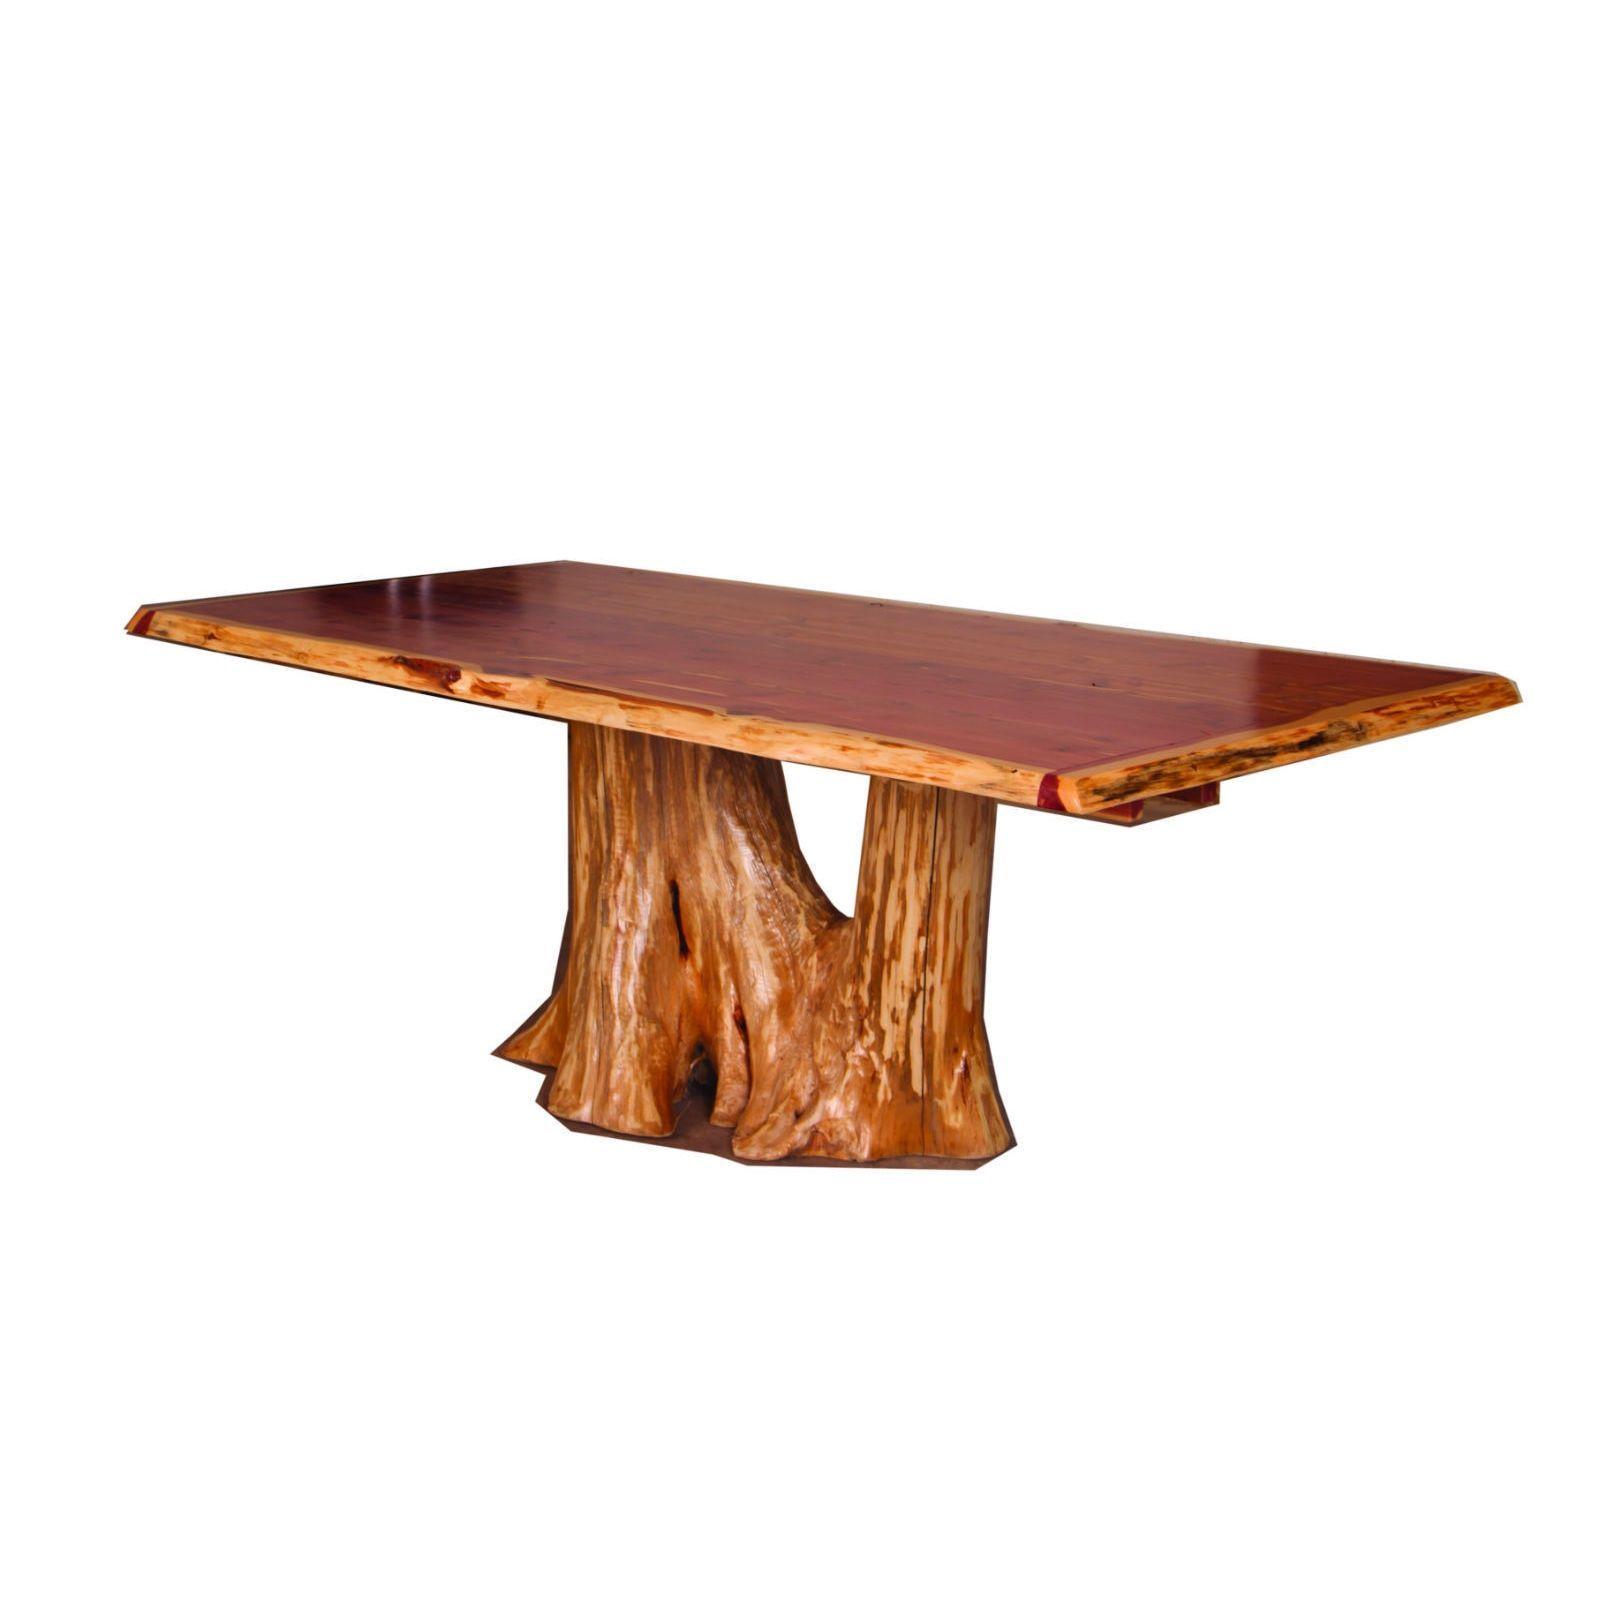 Rustic Red Cedar Log Tree Stump Trunk Dining Table Stump Table